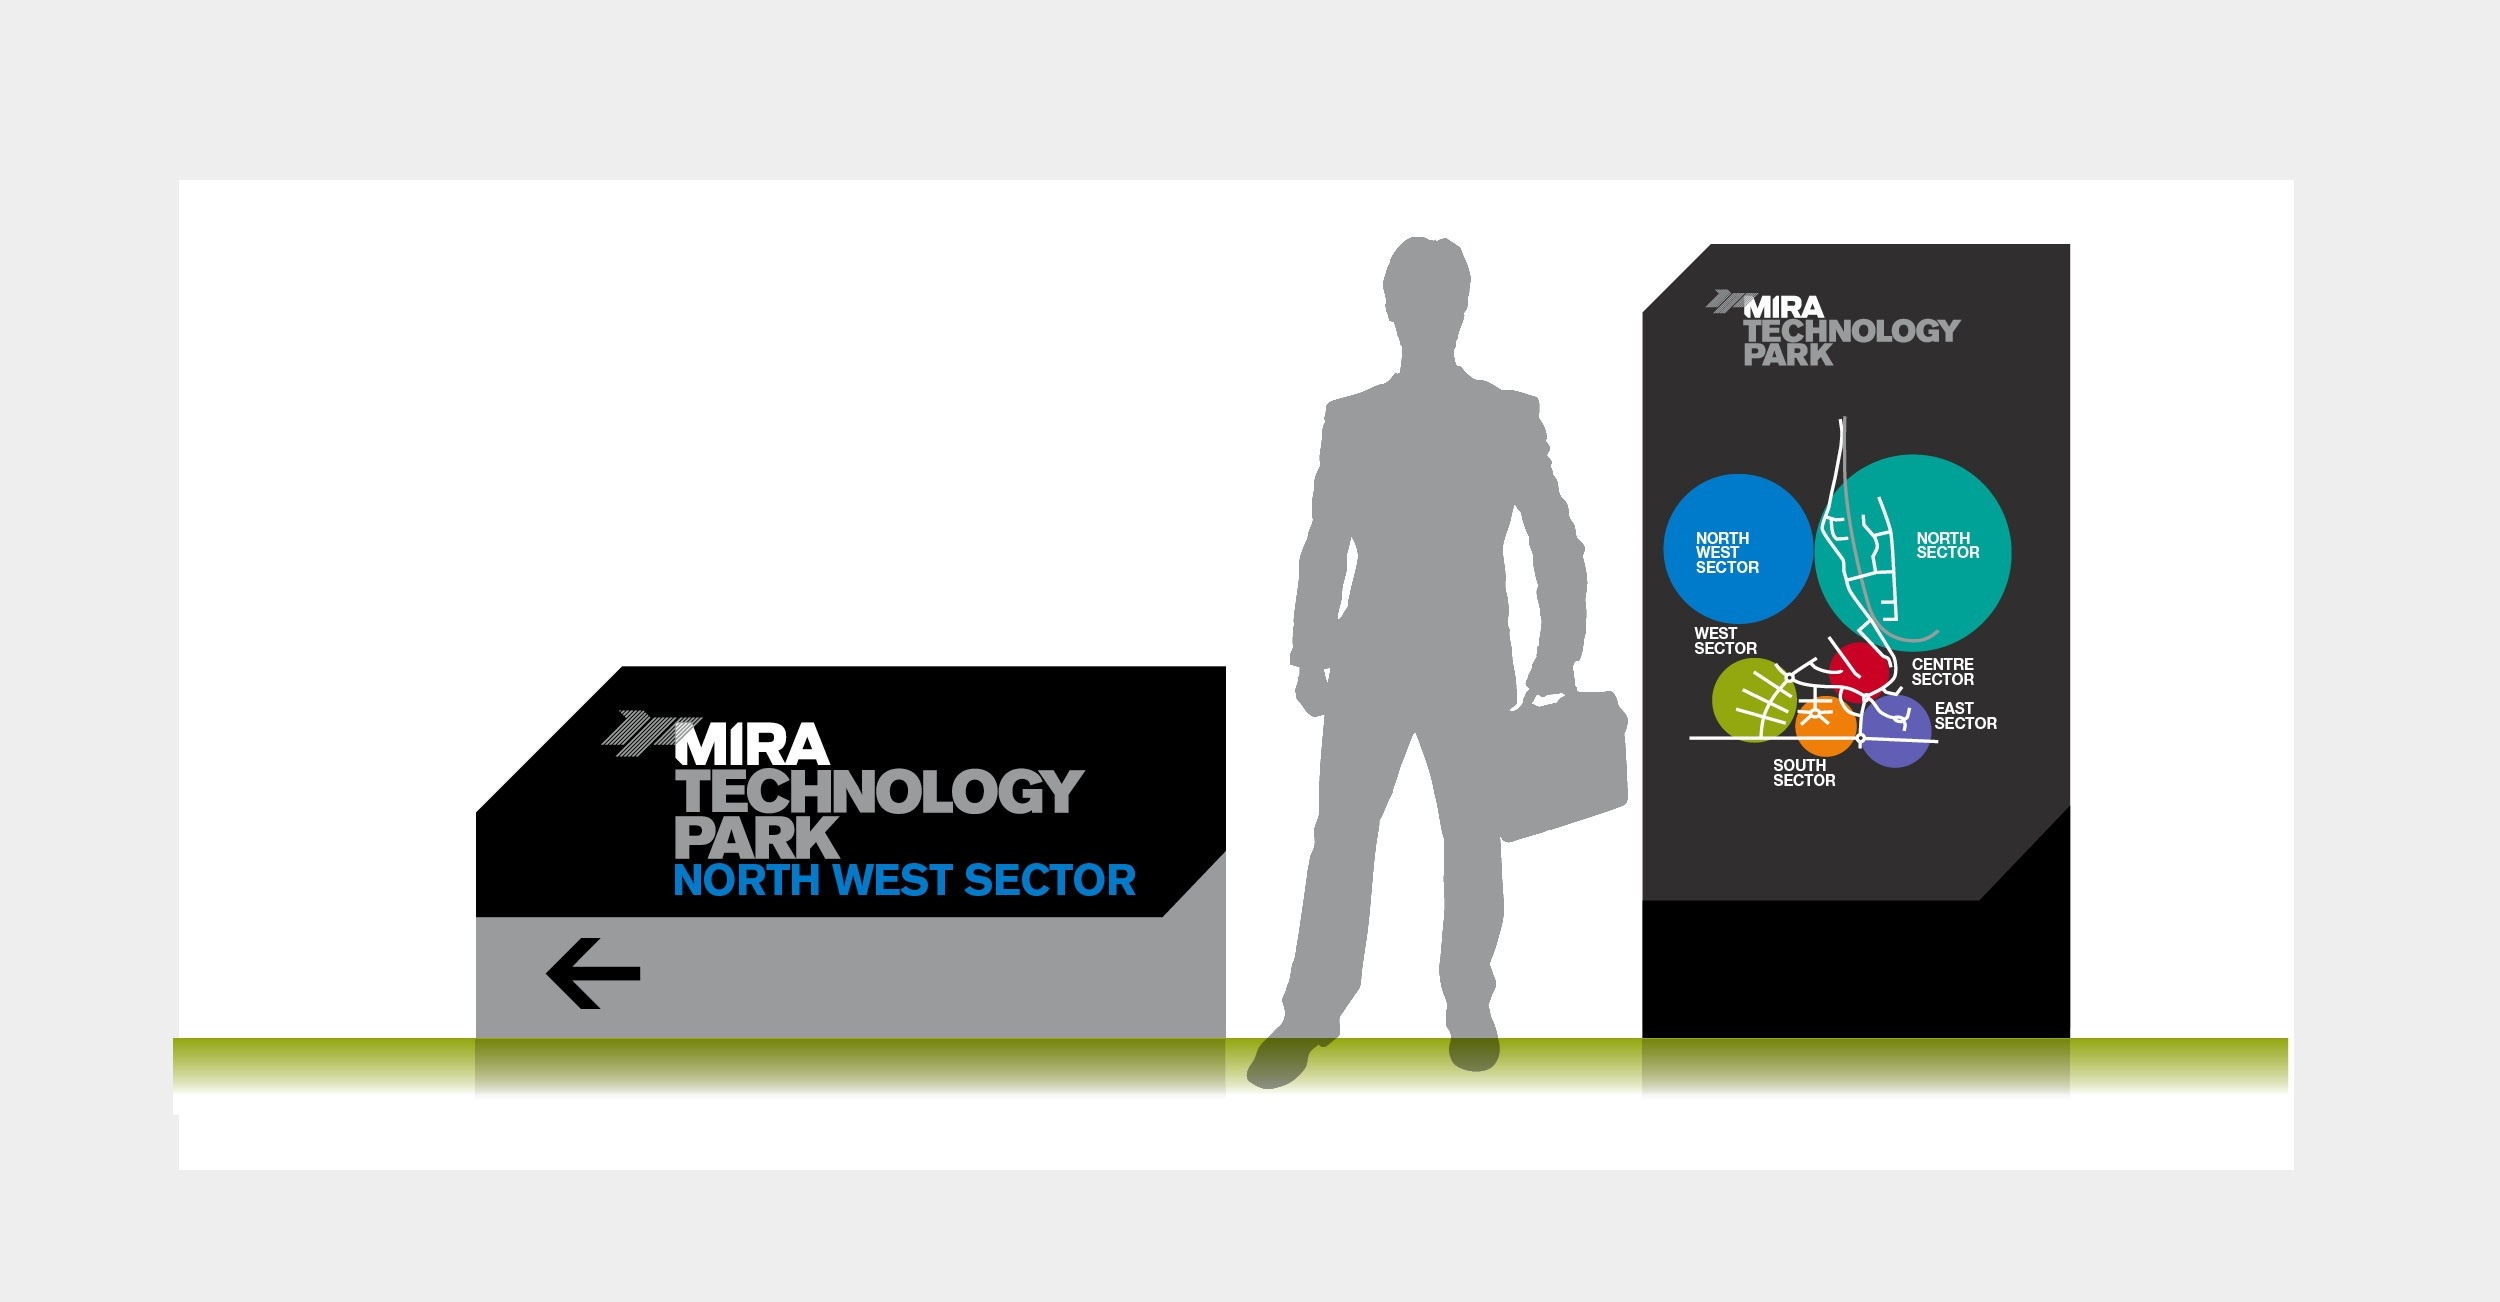 MIRA TECHNOLOGY PARK - 8